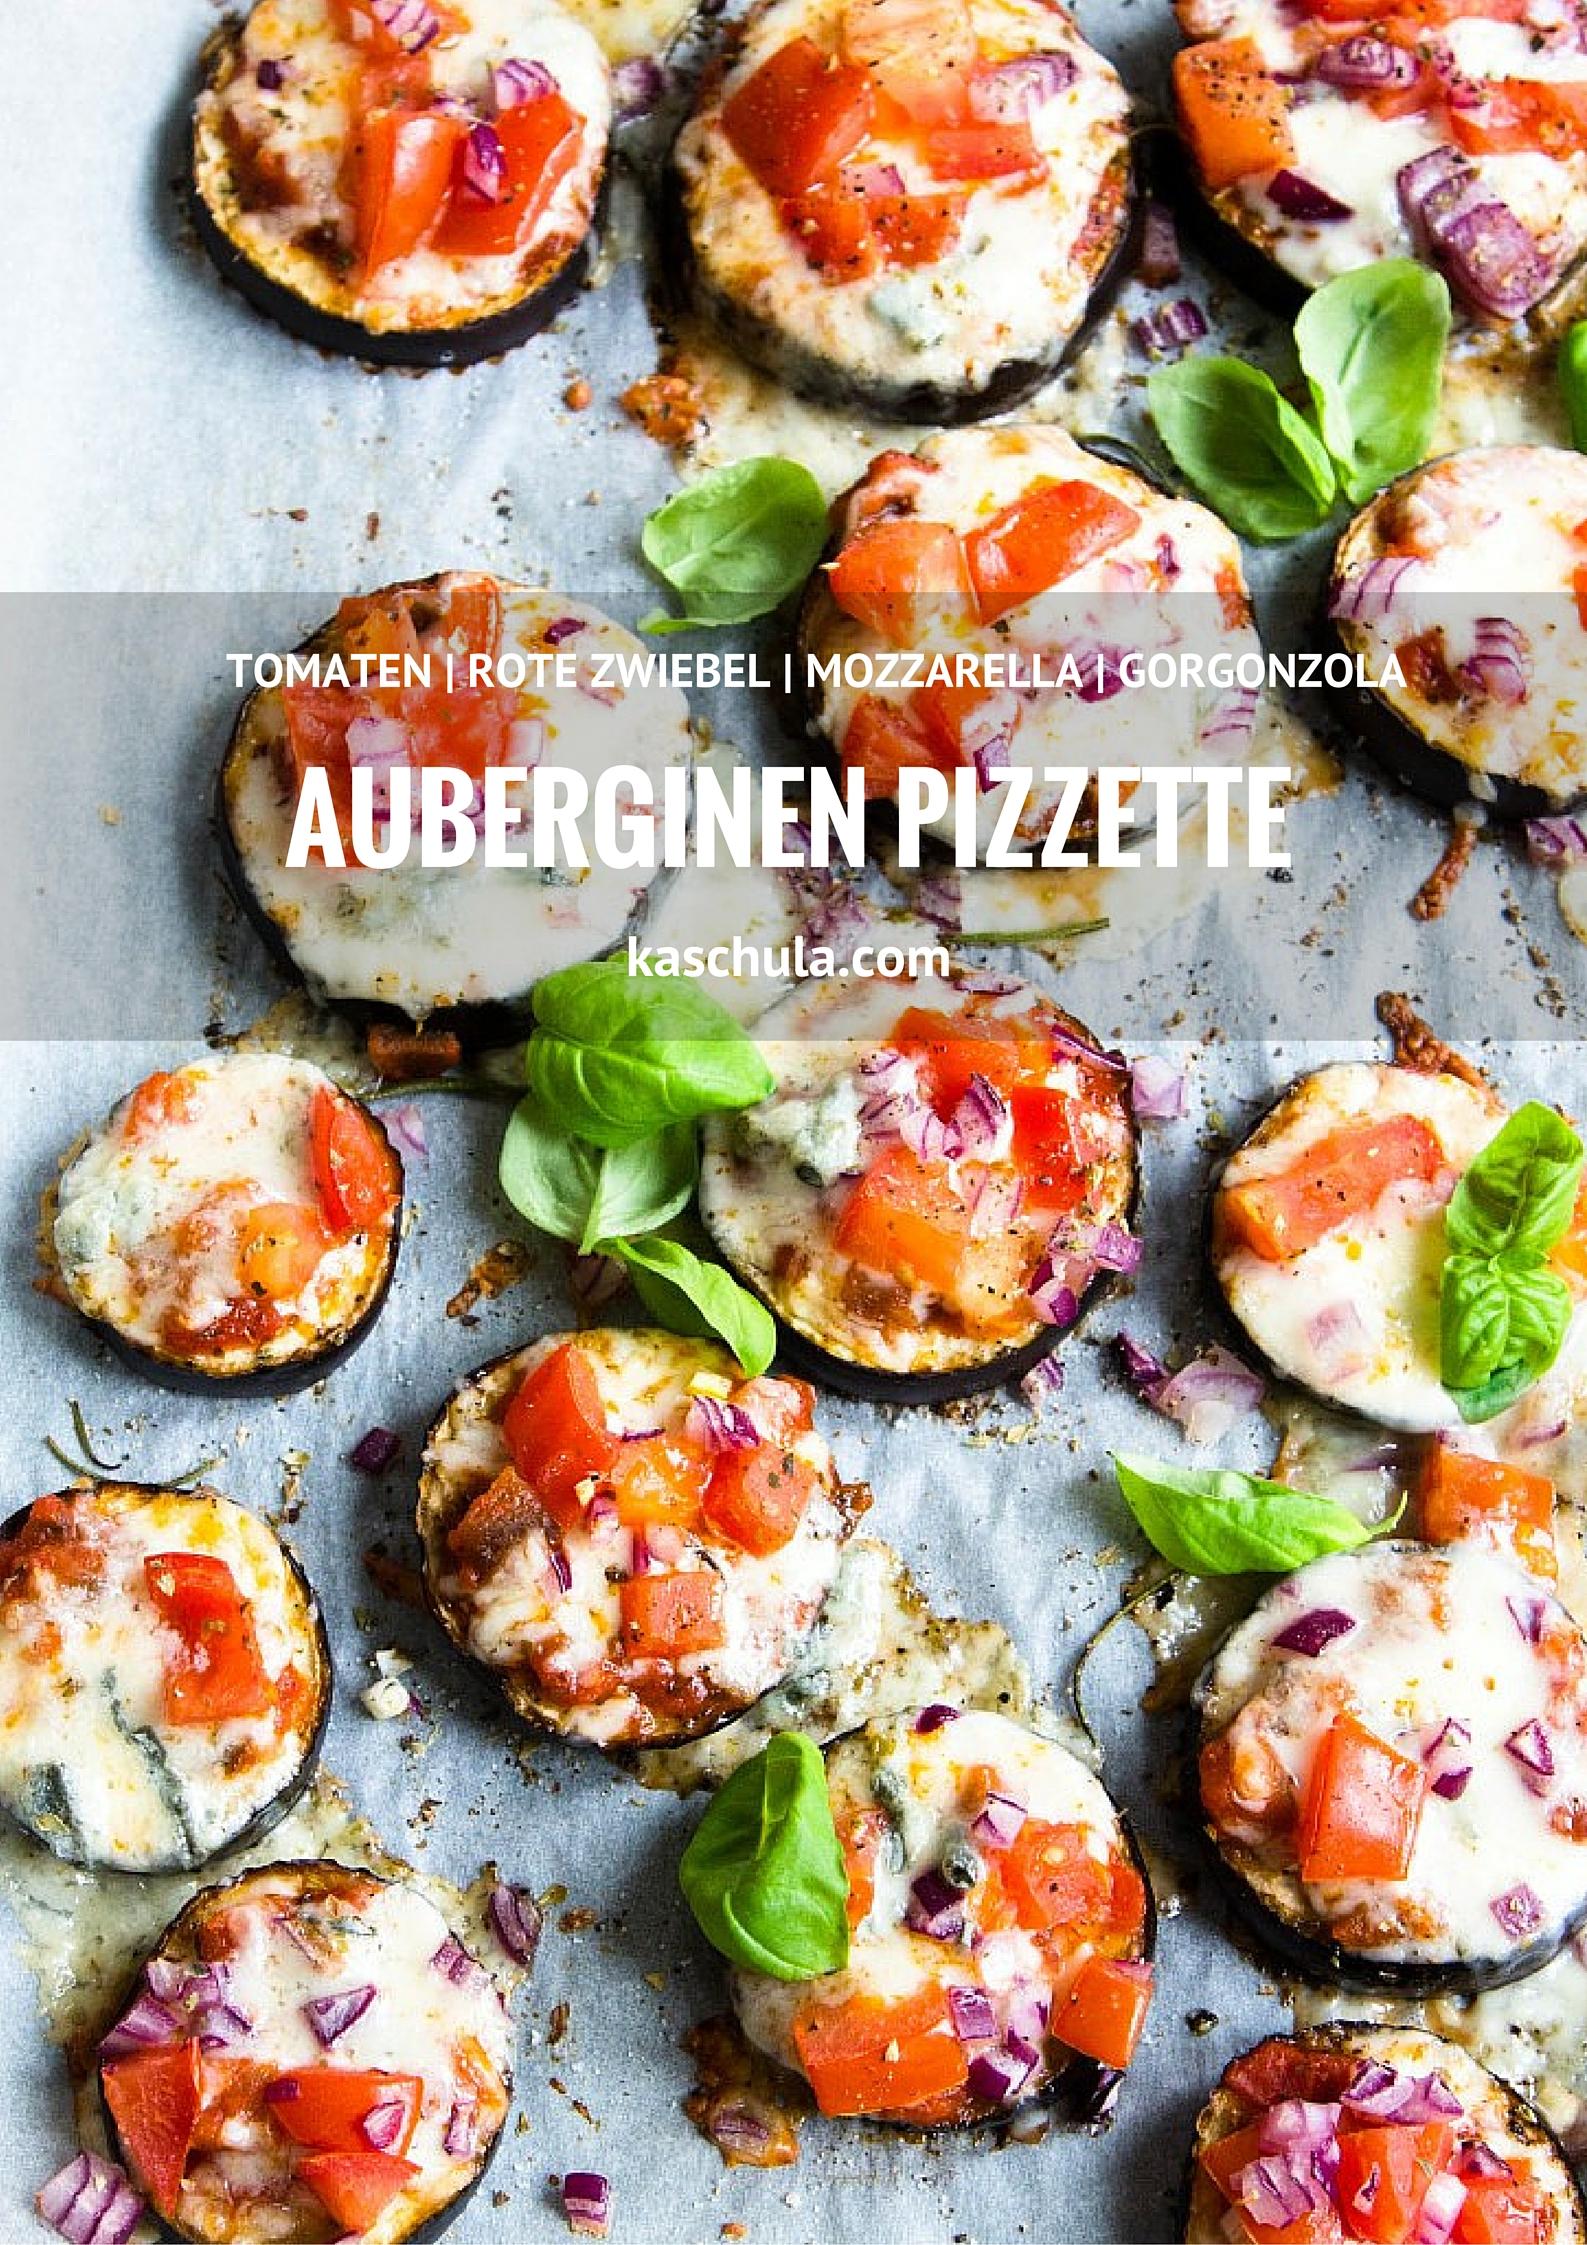 Auberginen-Pizzette-überbacken-Mozzarella-Gorgonzola-Tomate-Rezept-22